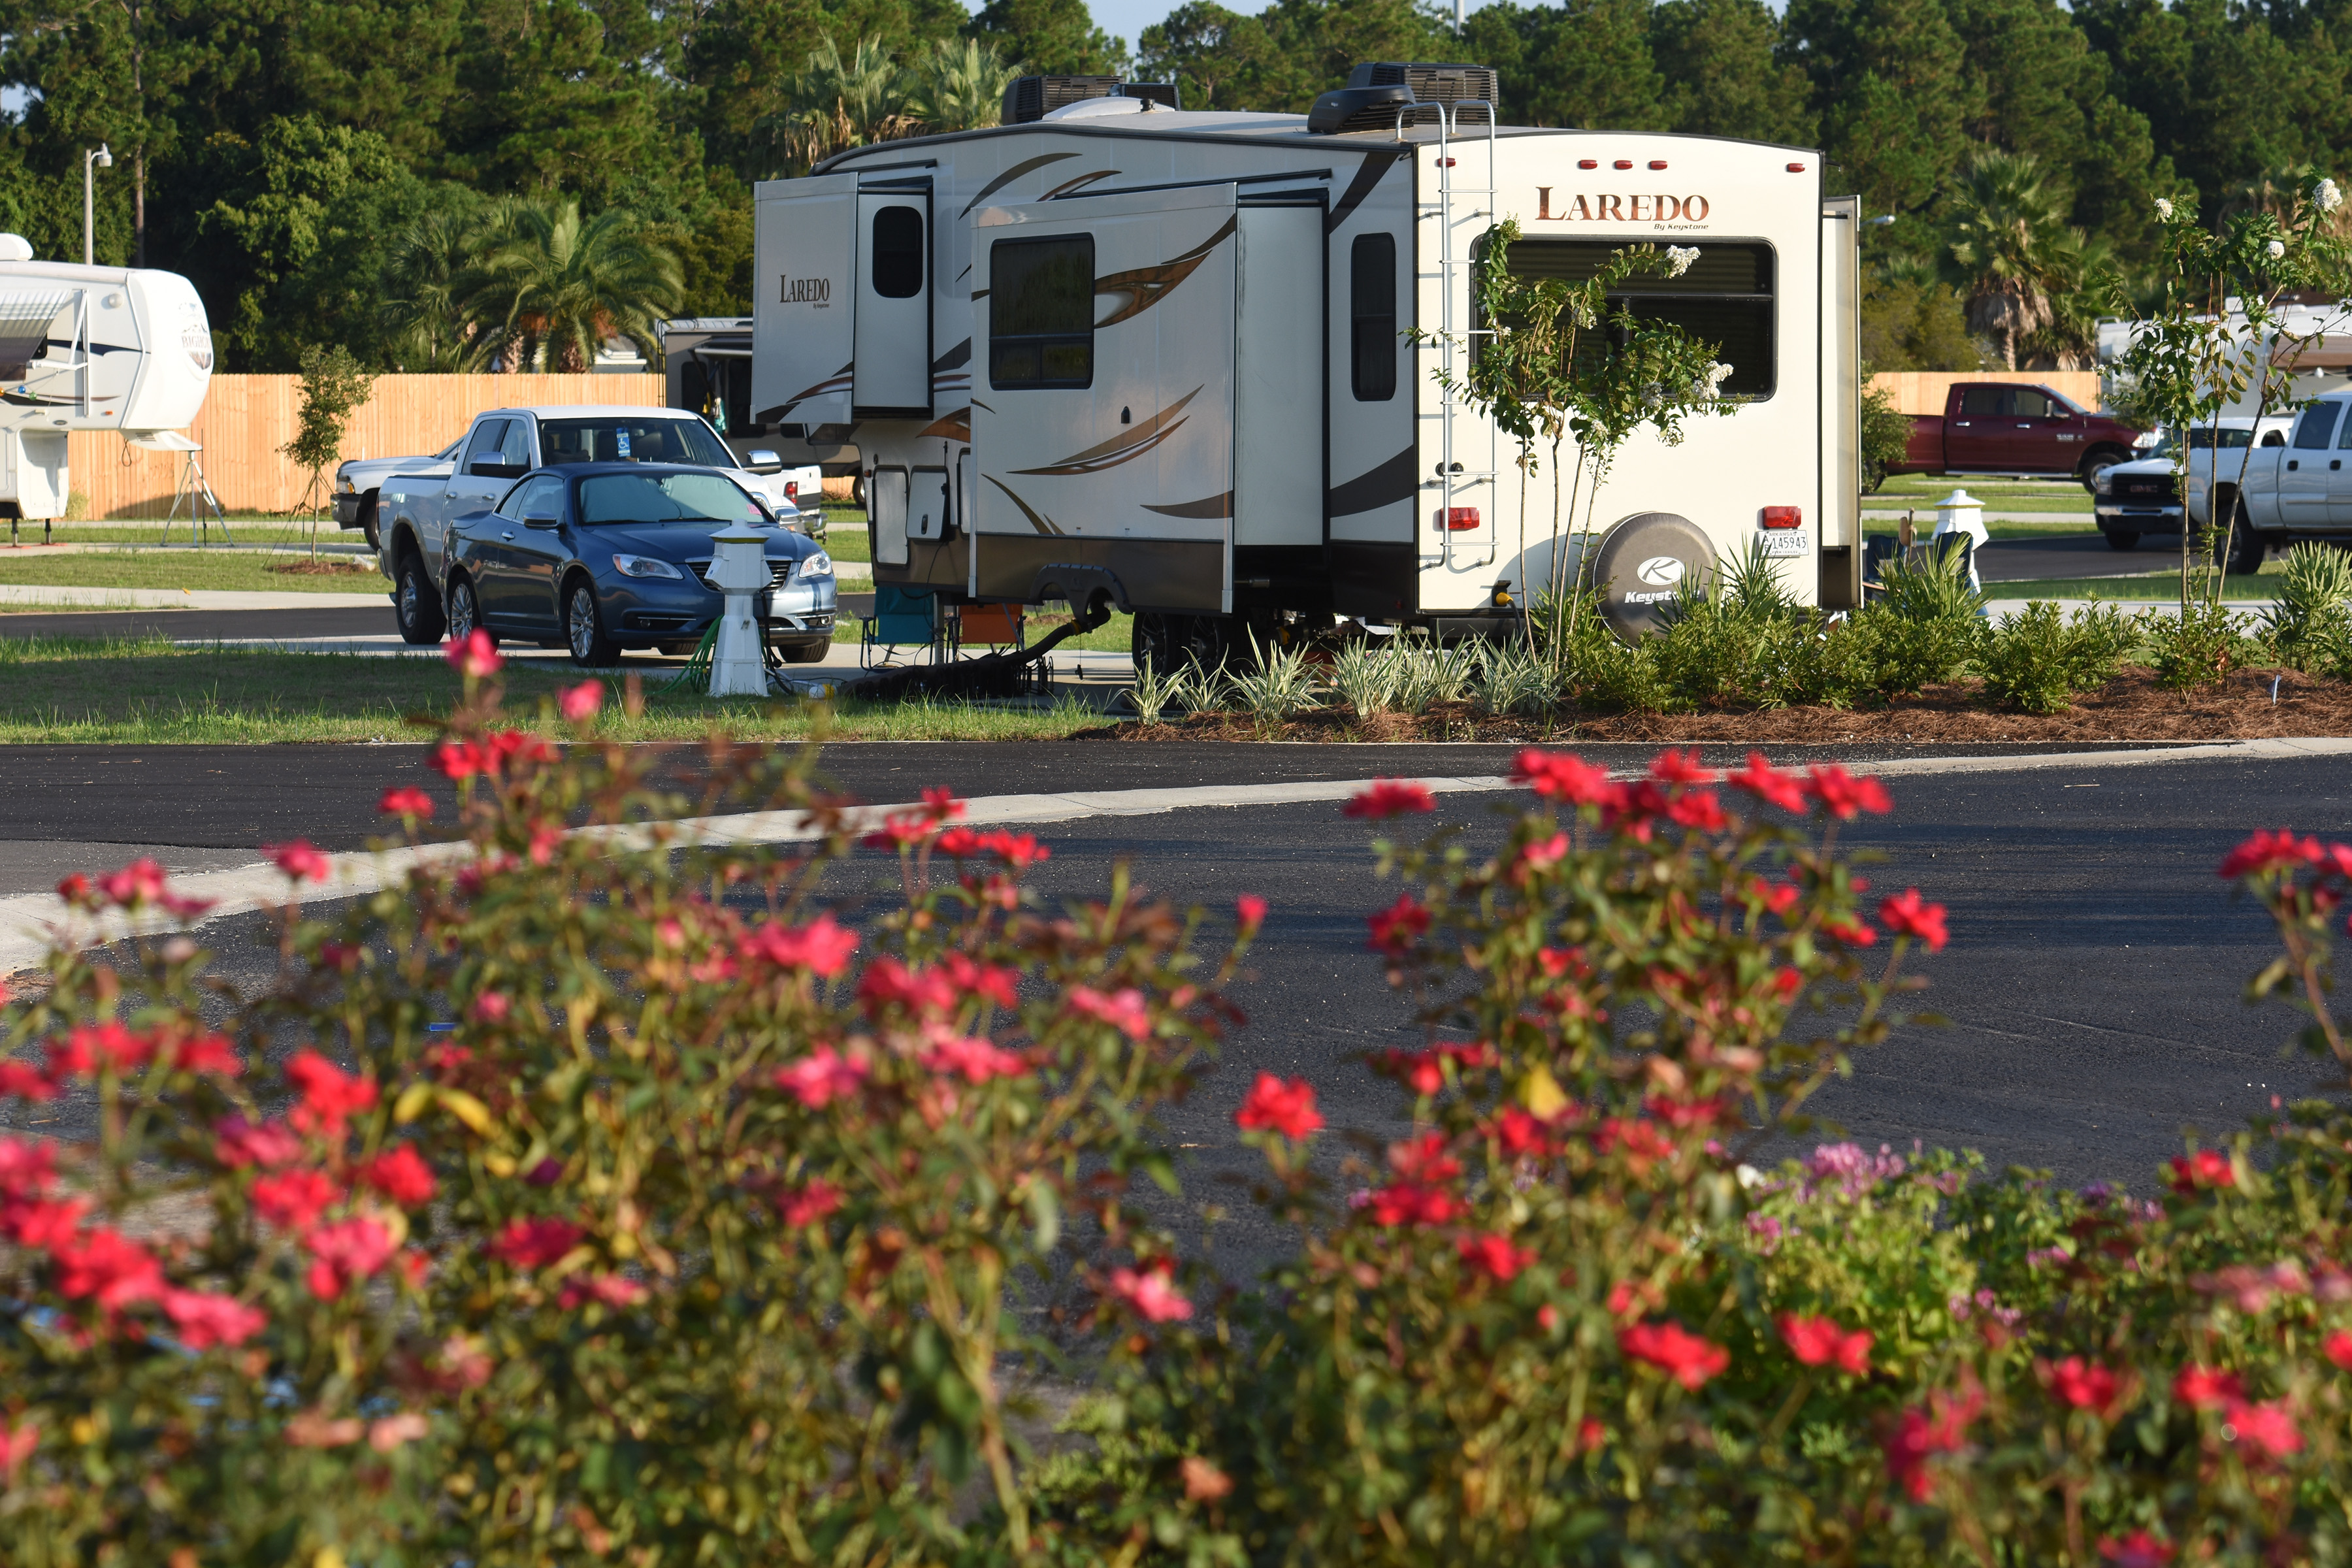 Pandion Ridge Luxury RV Resort - RV sites